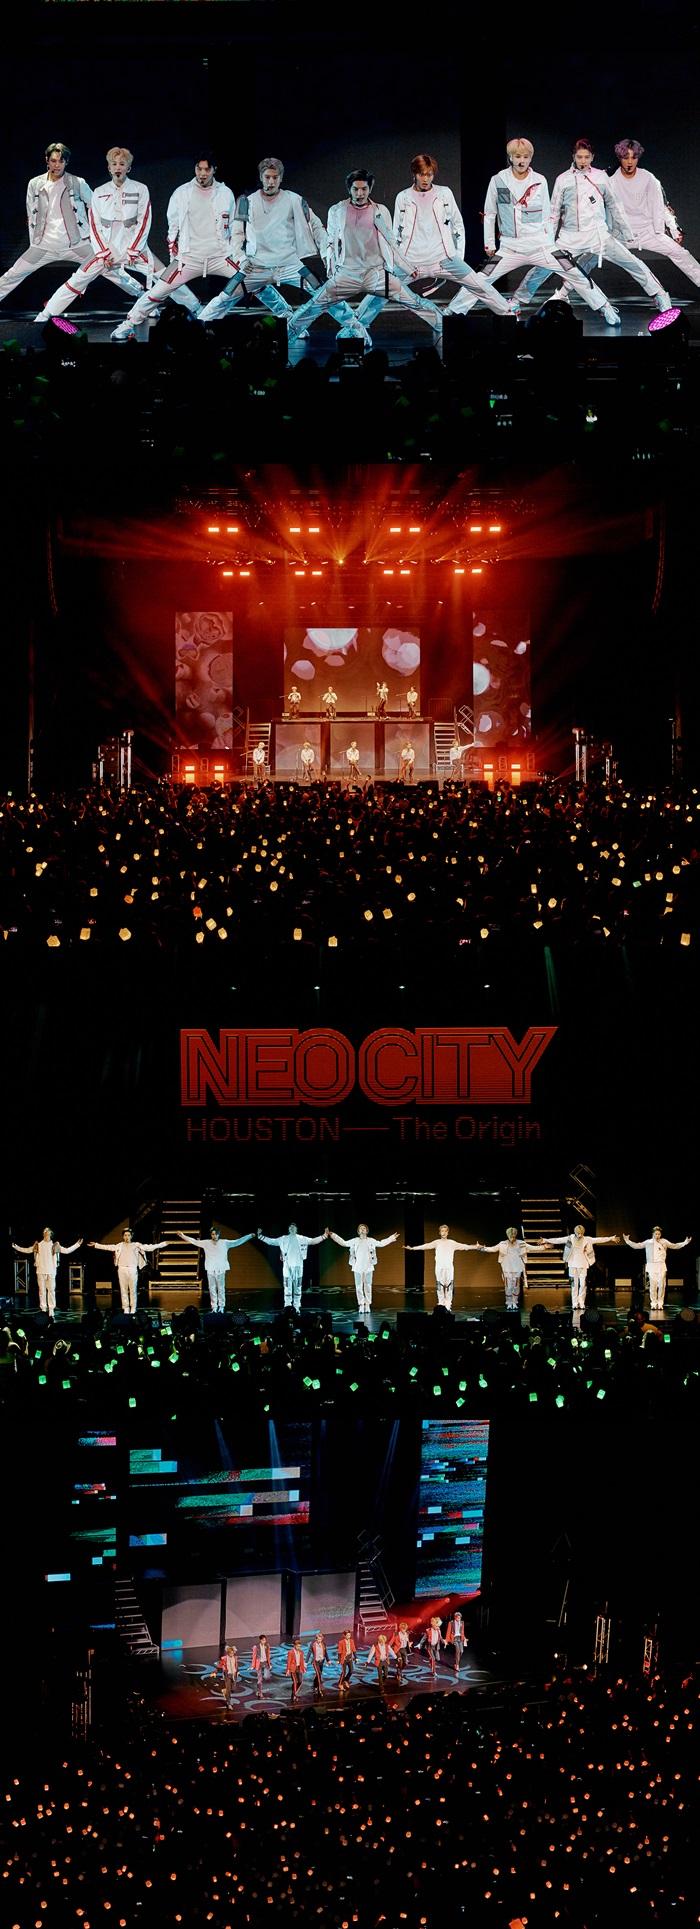 NCT 127, 북미 투어 반환점 돌았다…휴스턴 공연도 성료